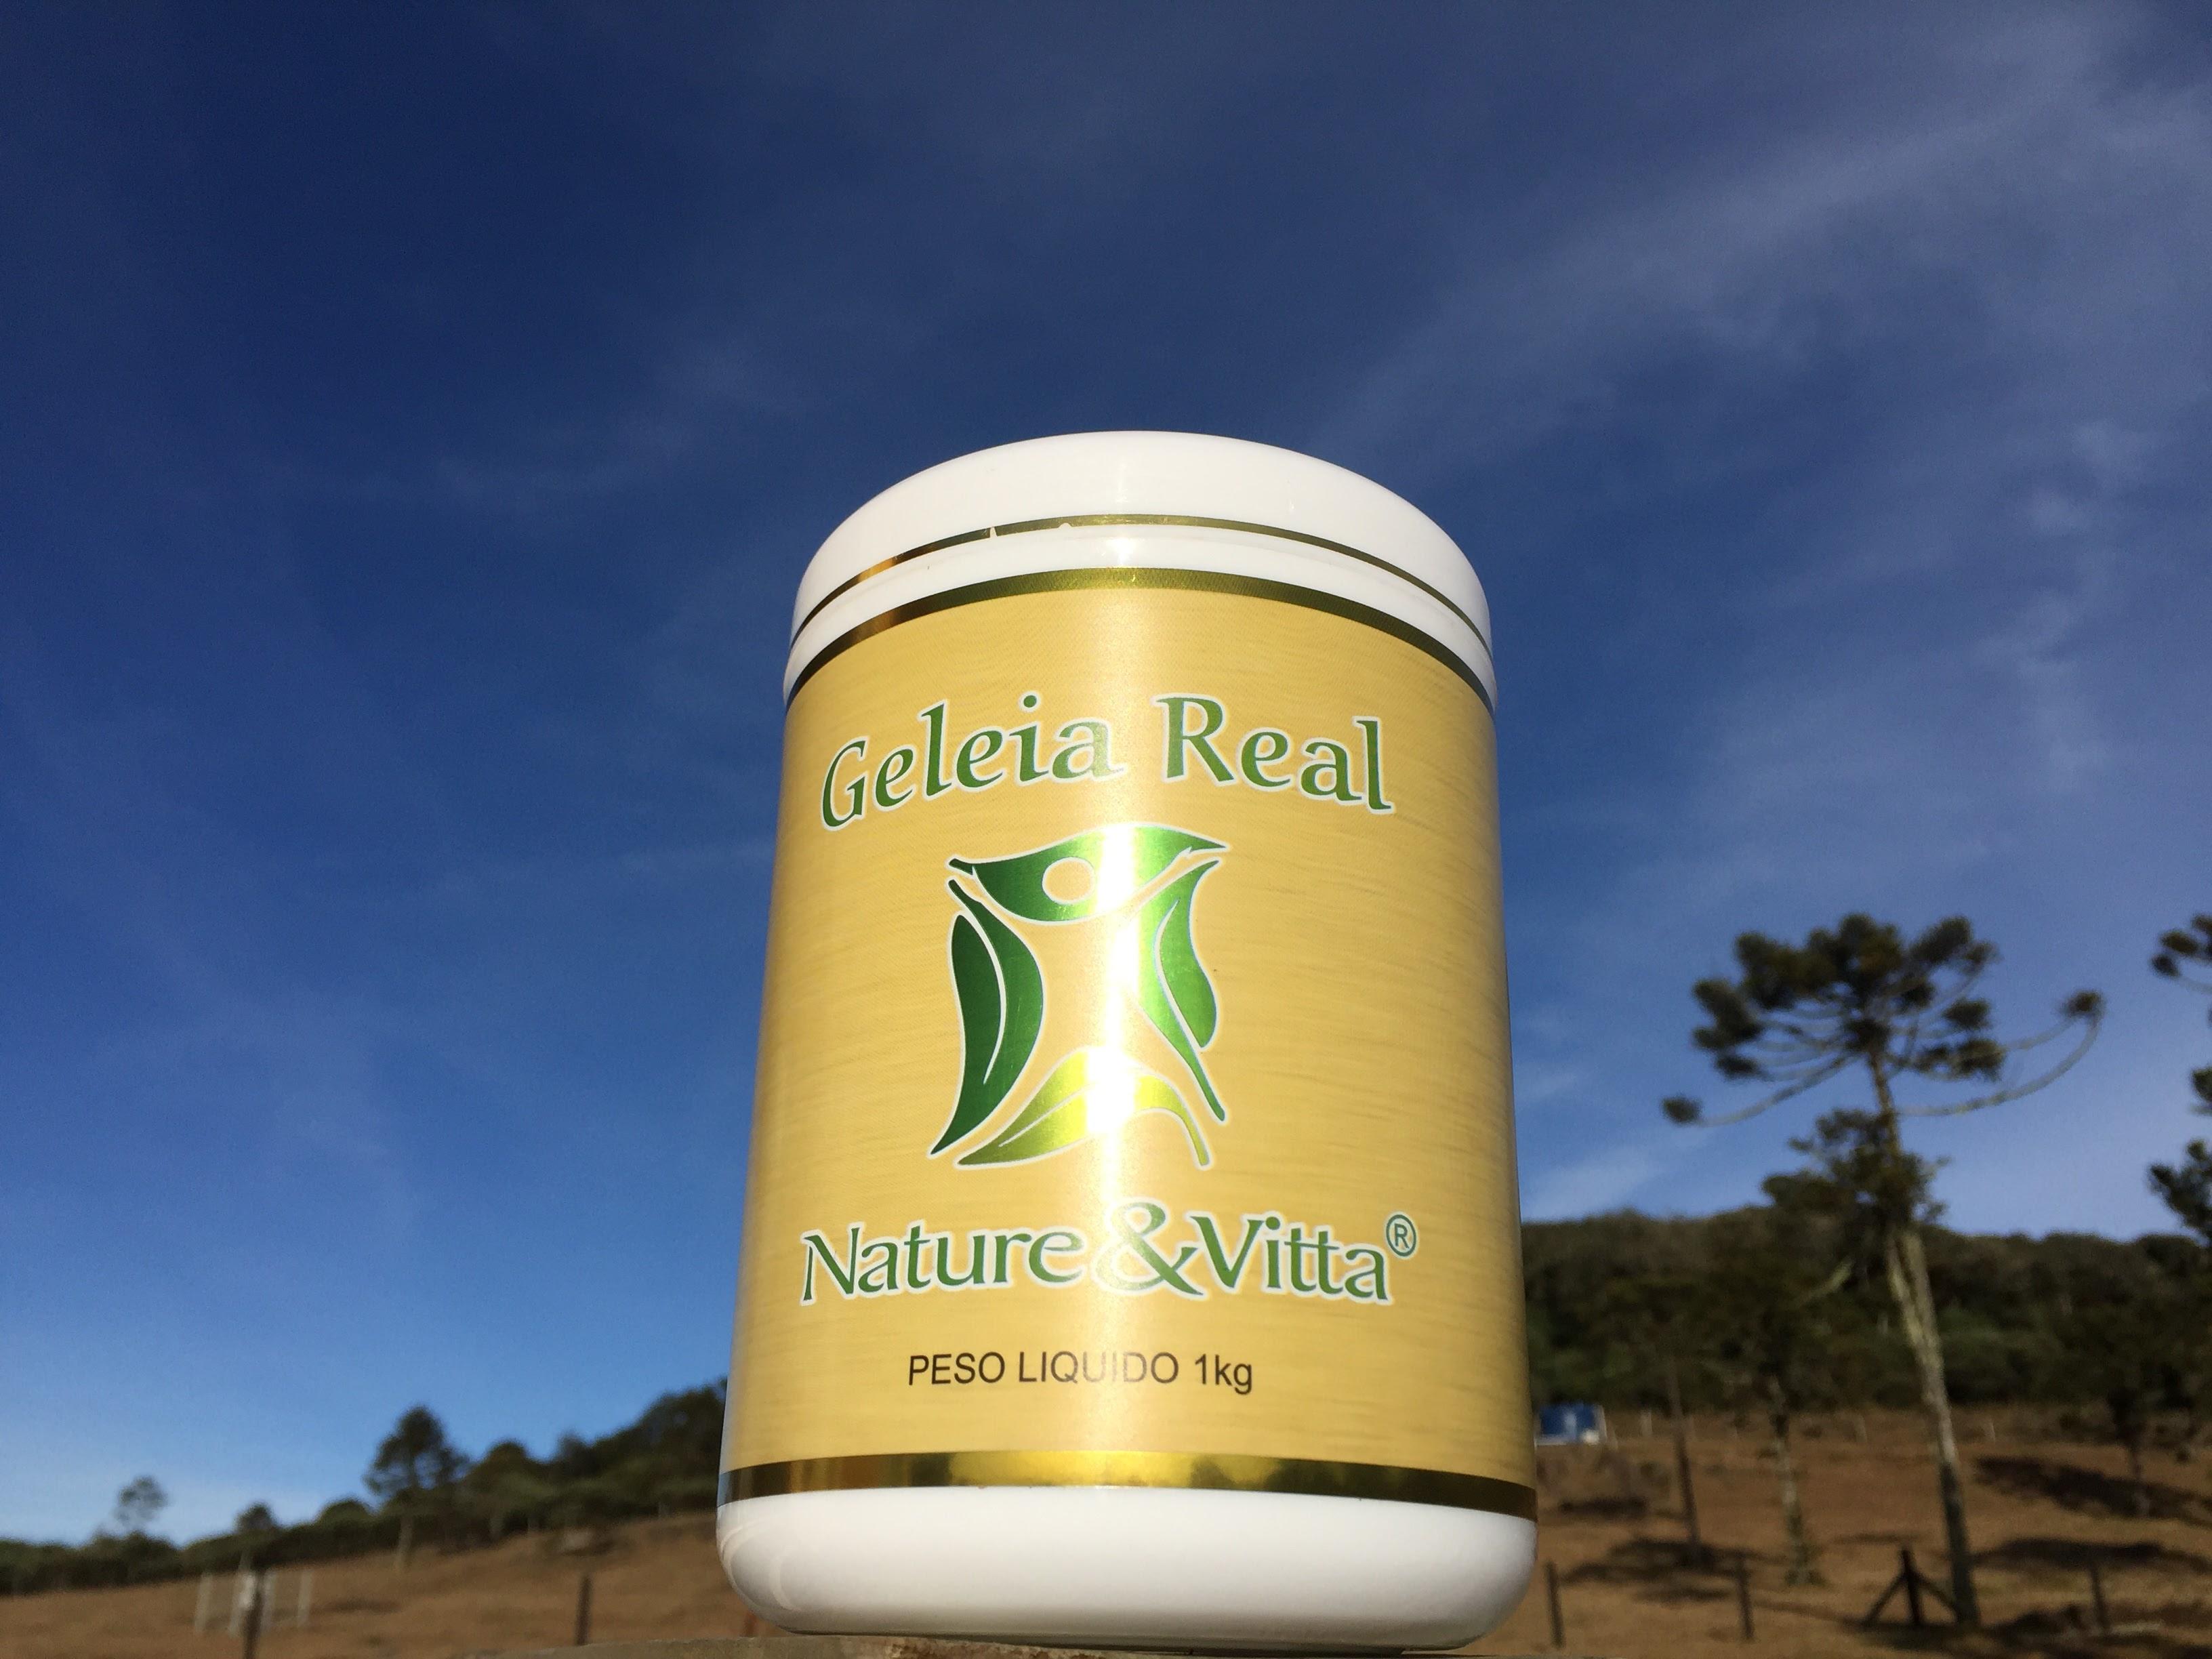 Geleia Real Nature&Vitta 1kg